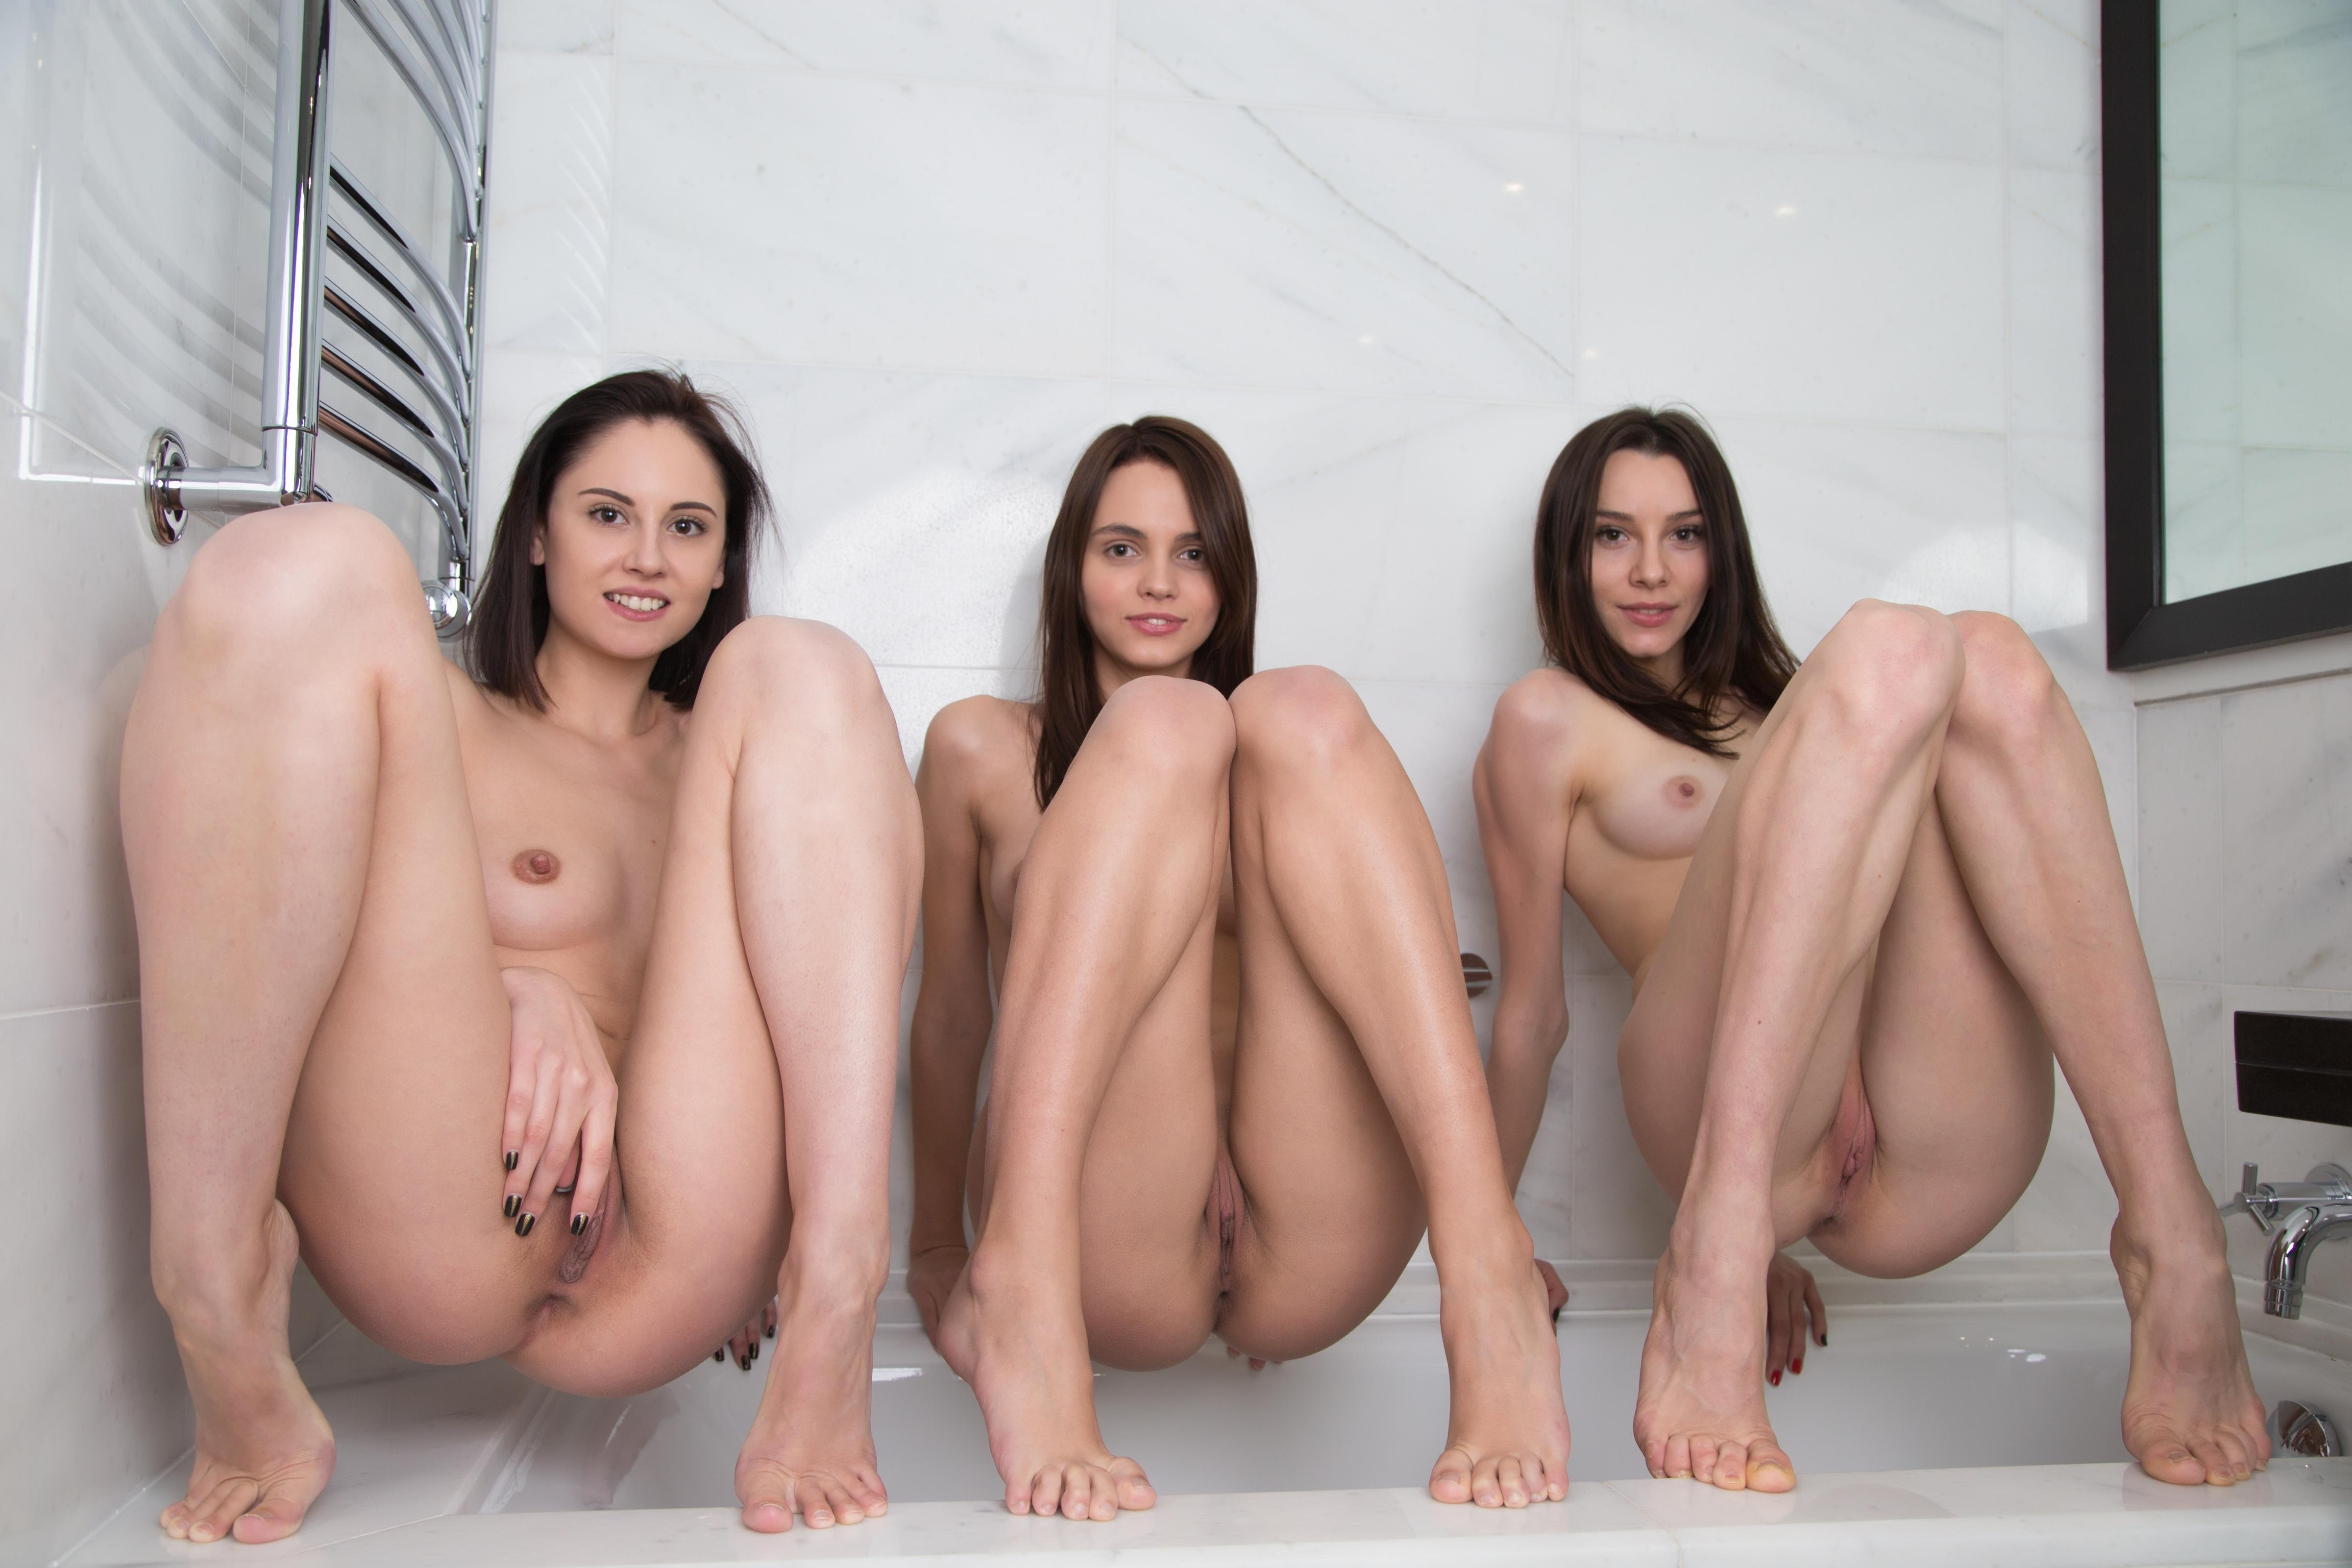 naked-trio-girls-photo-mix-lesbians-vol3-74